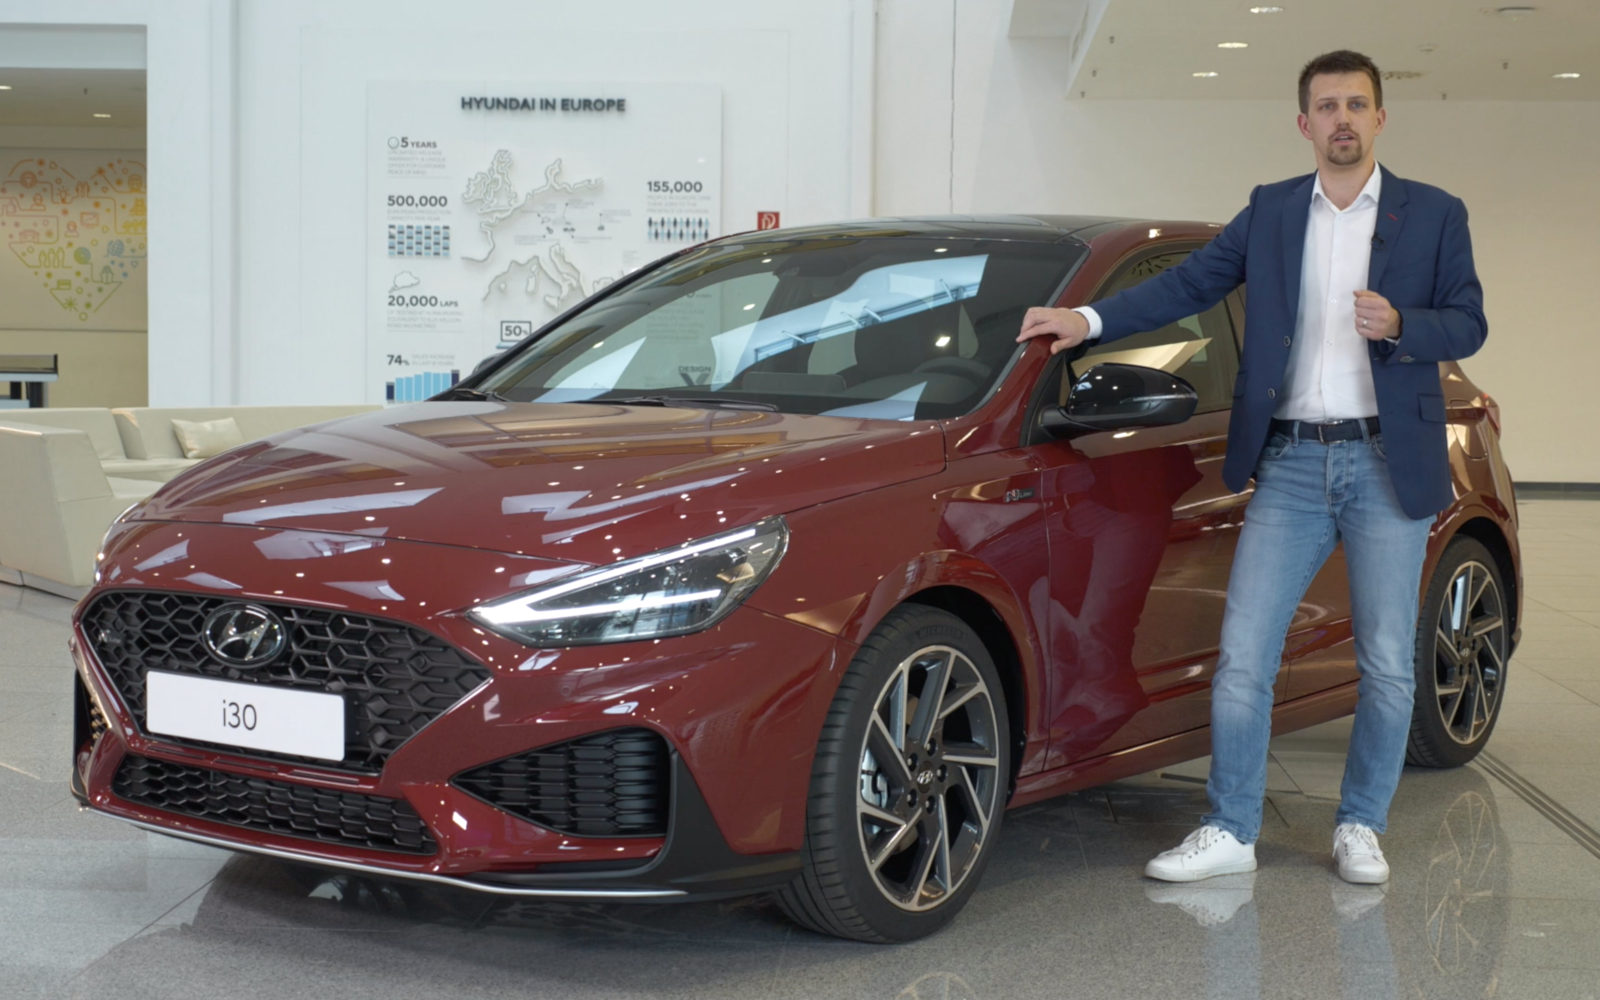 Discover More Details of Hyundai i30 Facelift